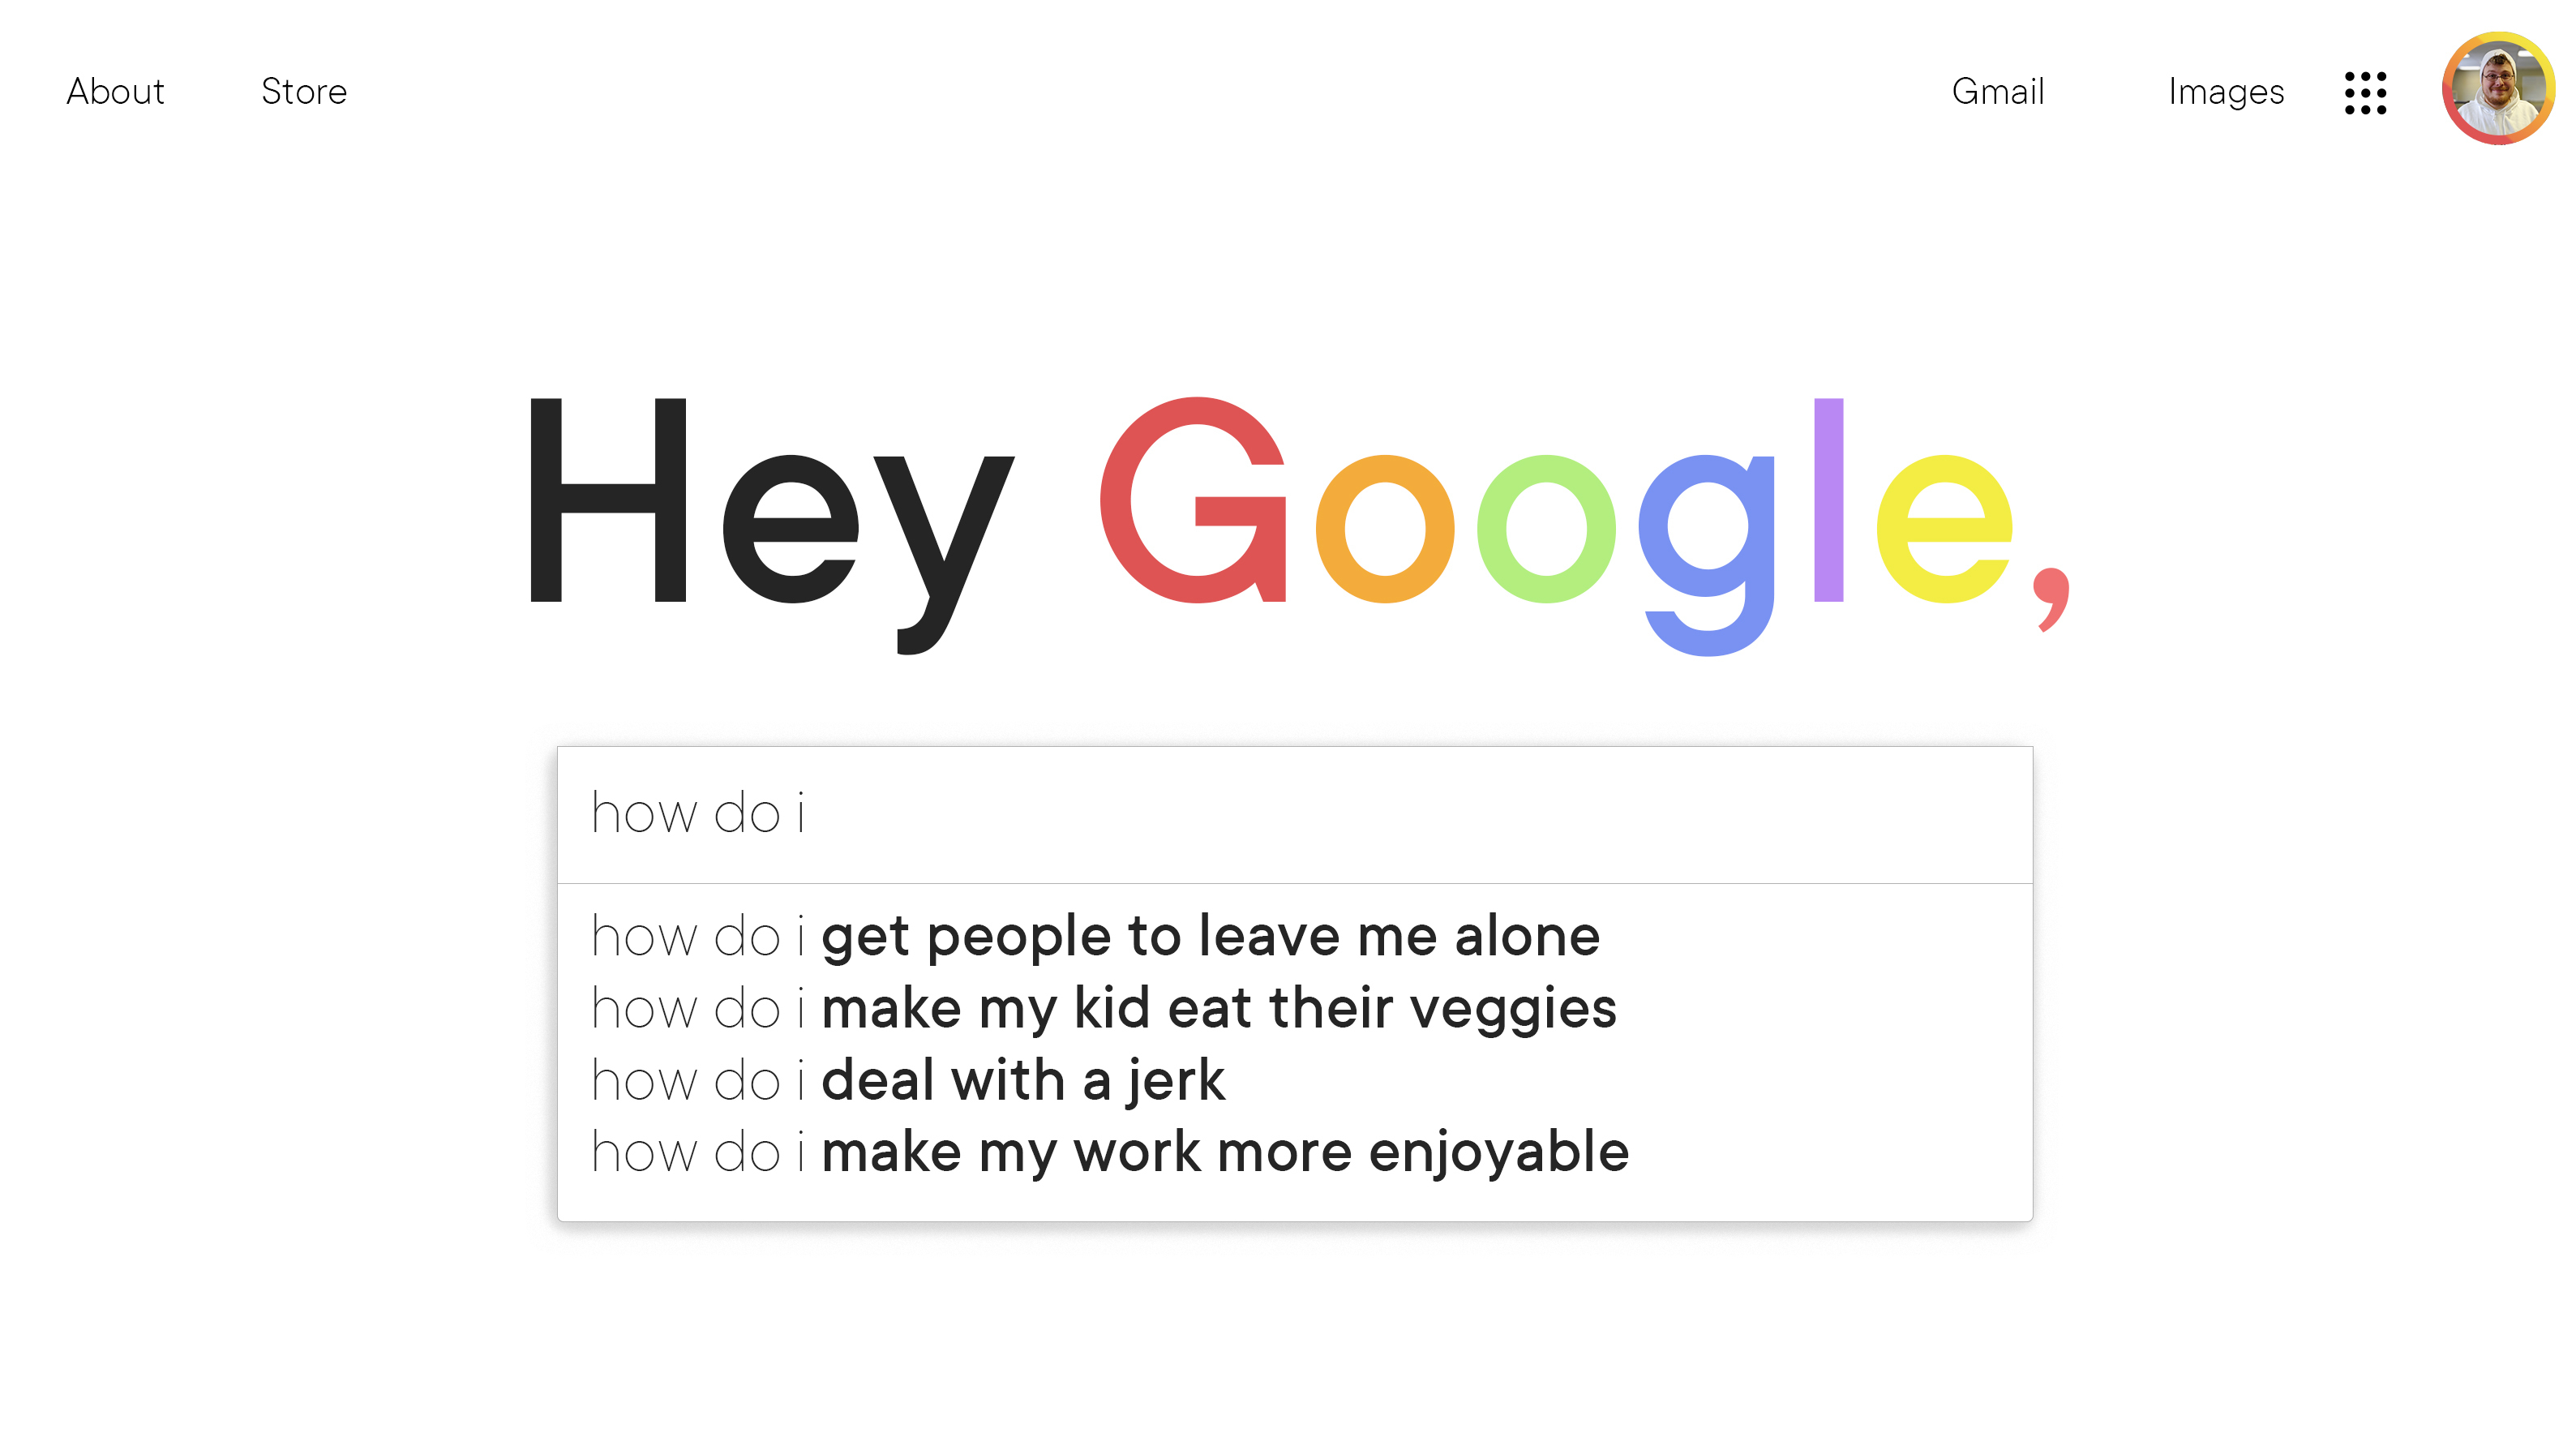 Hey Google, Part 1 on Livestream